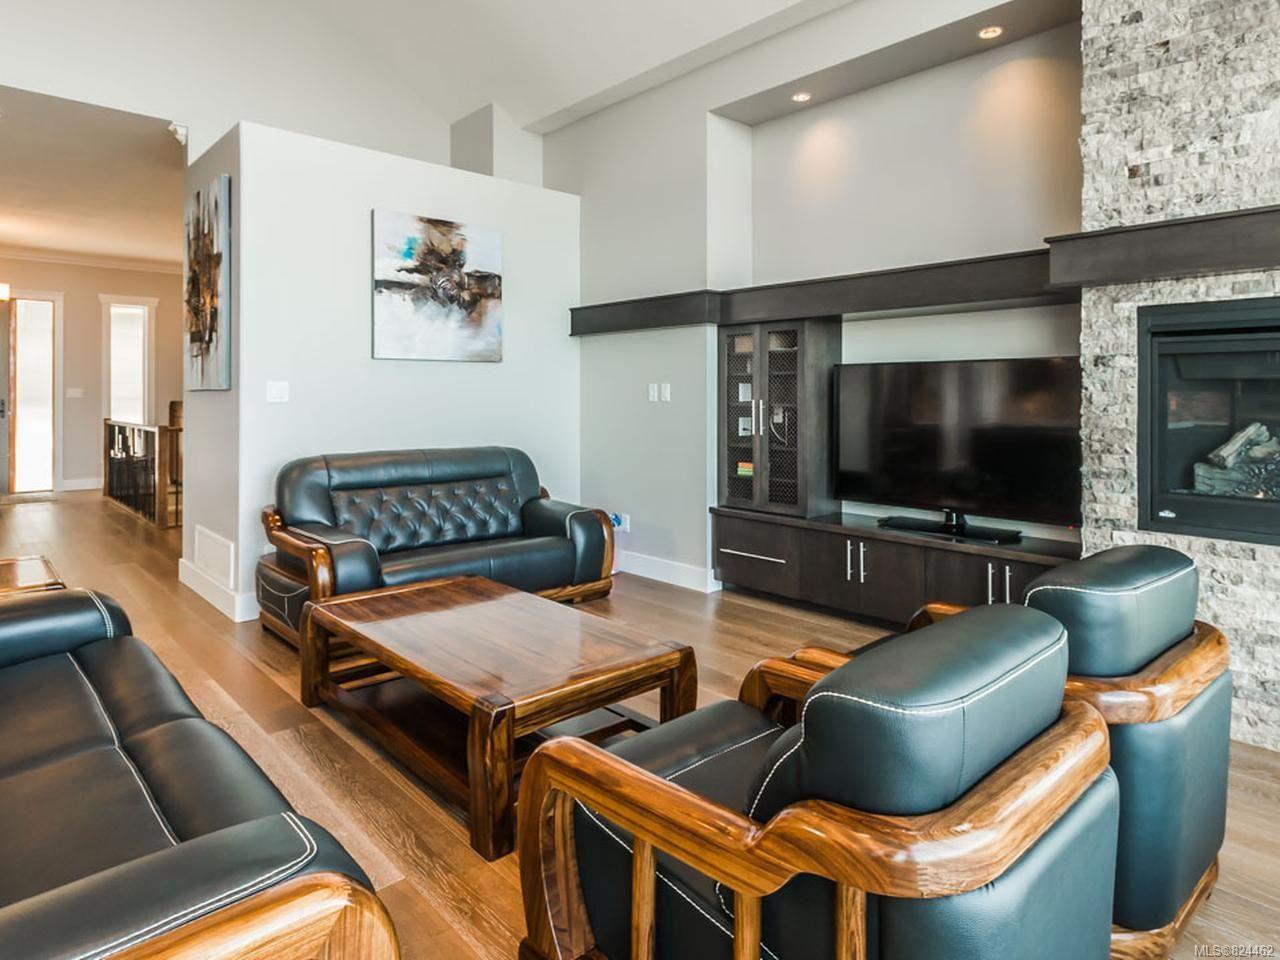 Photo 9: Photos: 3864 Gulfview Dr in NANAIMO: Na North Nanaimo House for sale (Nanaimo)  : MLS®# 824462